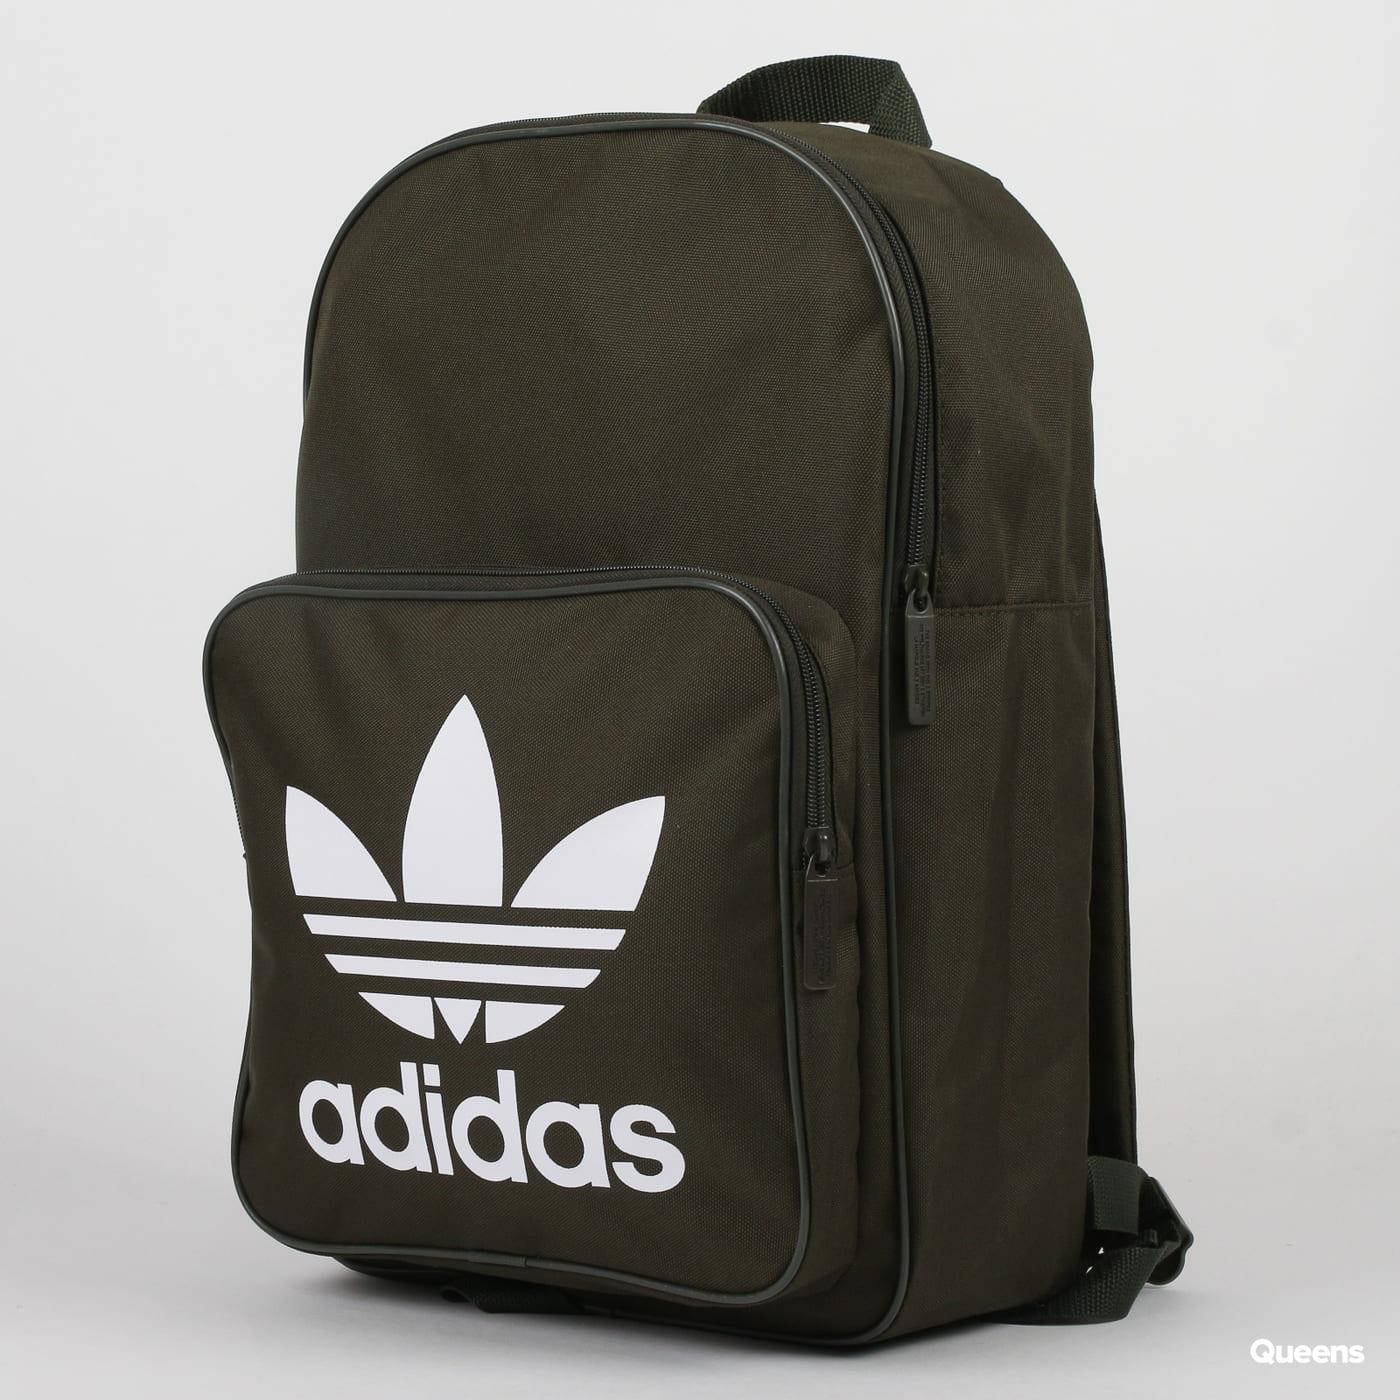 54ae01259b0d2 Rucksack adidas Originals Backpack Classic Trefoil olive (DW5187) – Queens  💚